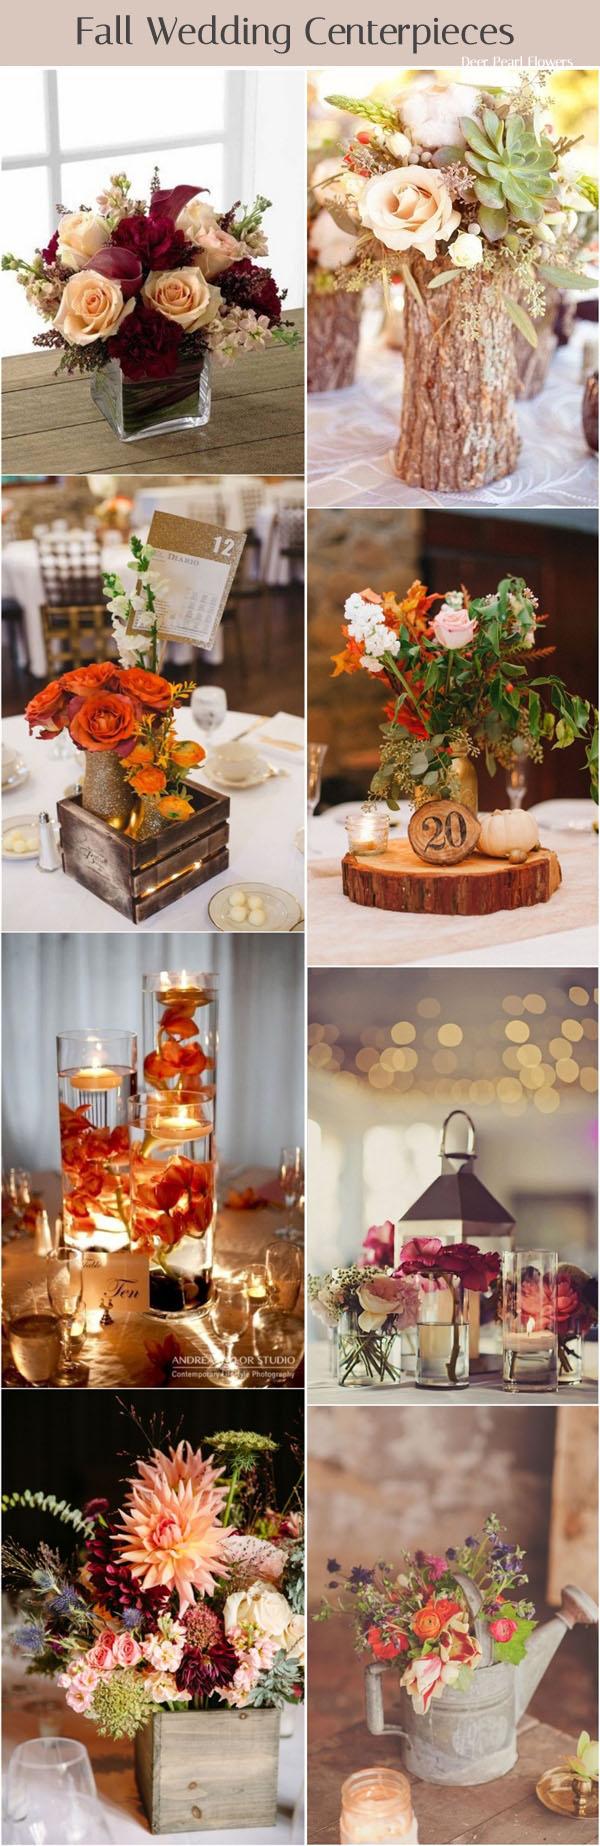 Wedding Ideas Fall 76 Of The Best Fall Wedding Ideas For 2019 Deer Pearl Flowers